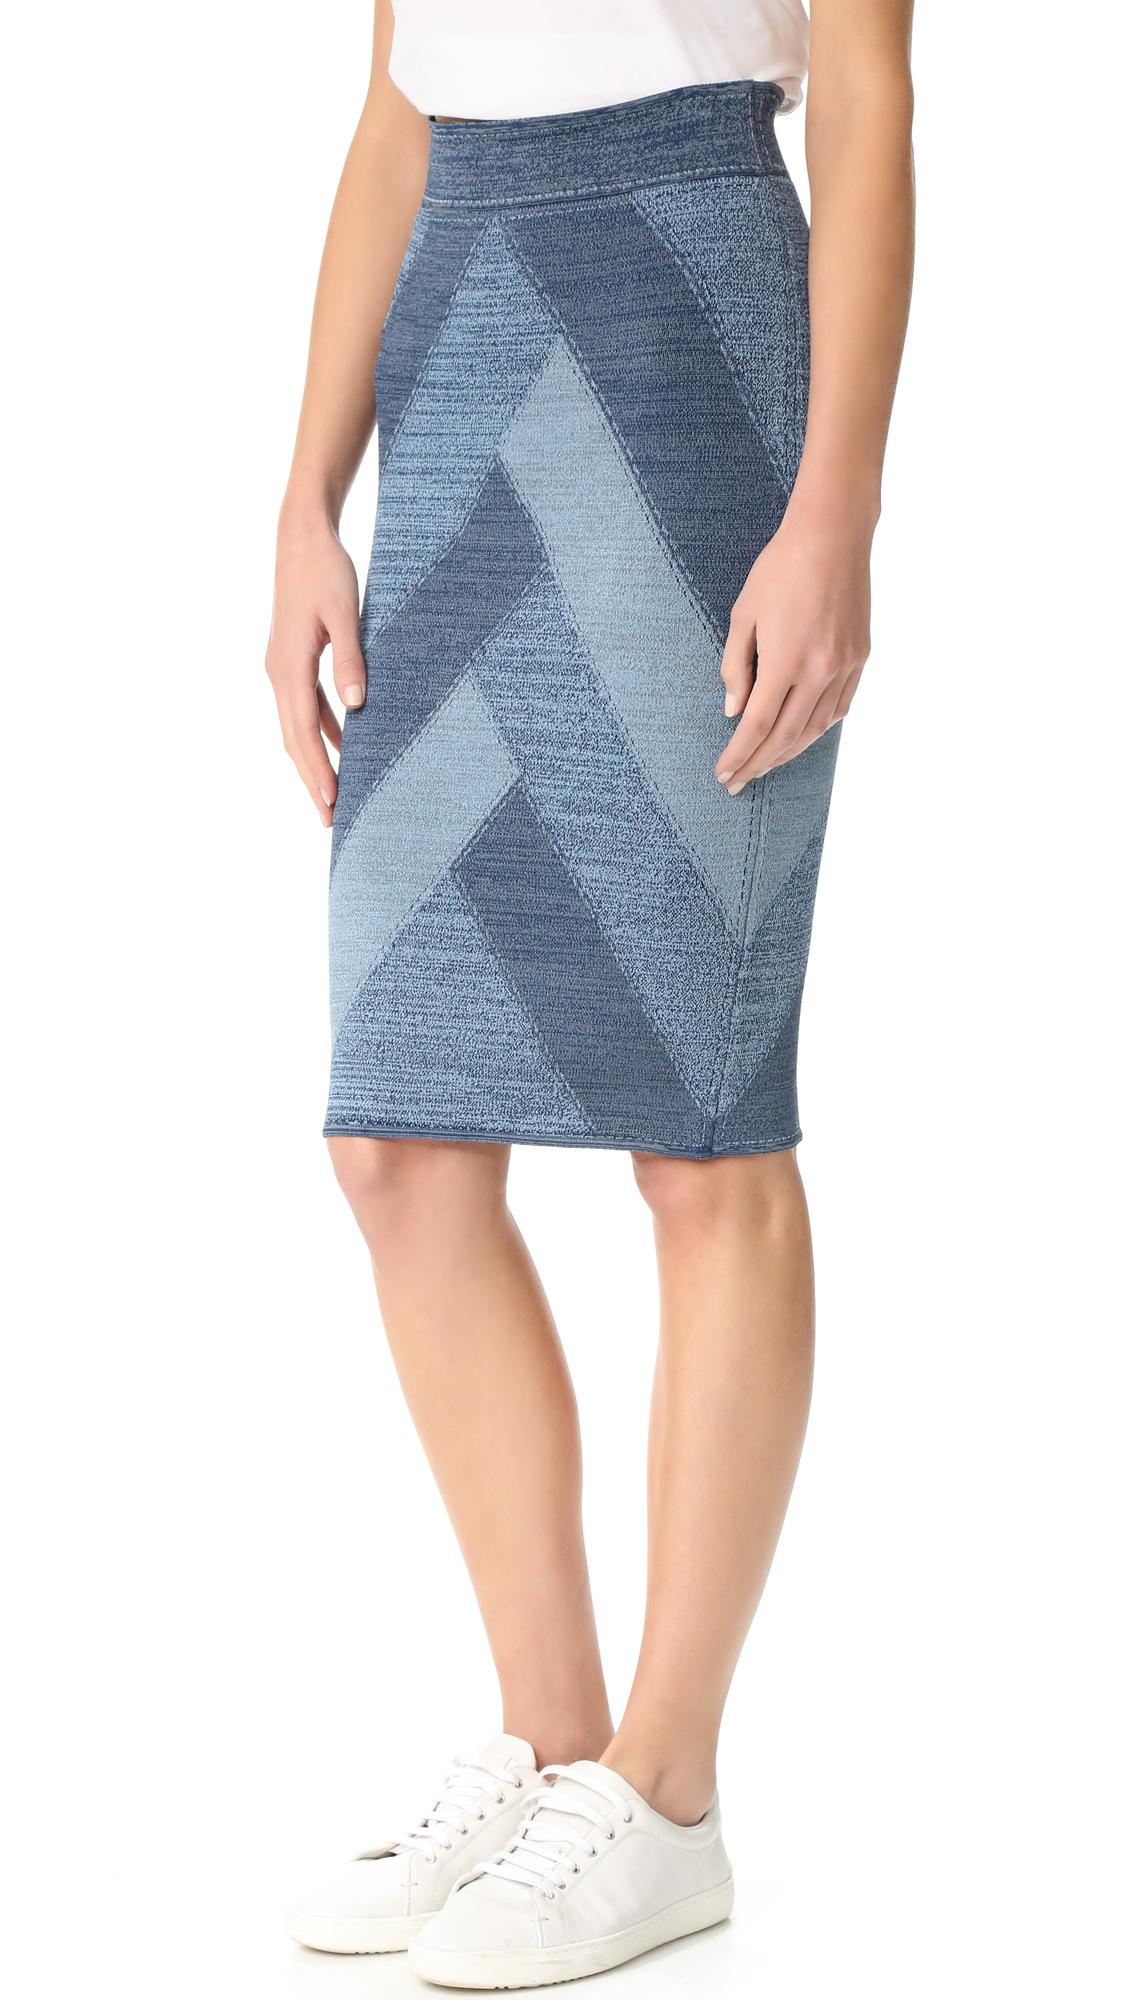 Bcbgmaxazria Patchwork Denim Skirt - Denim Combo at Shopbop